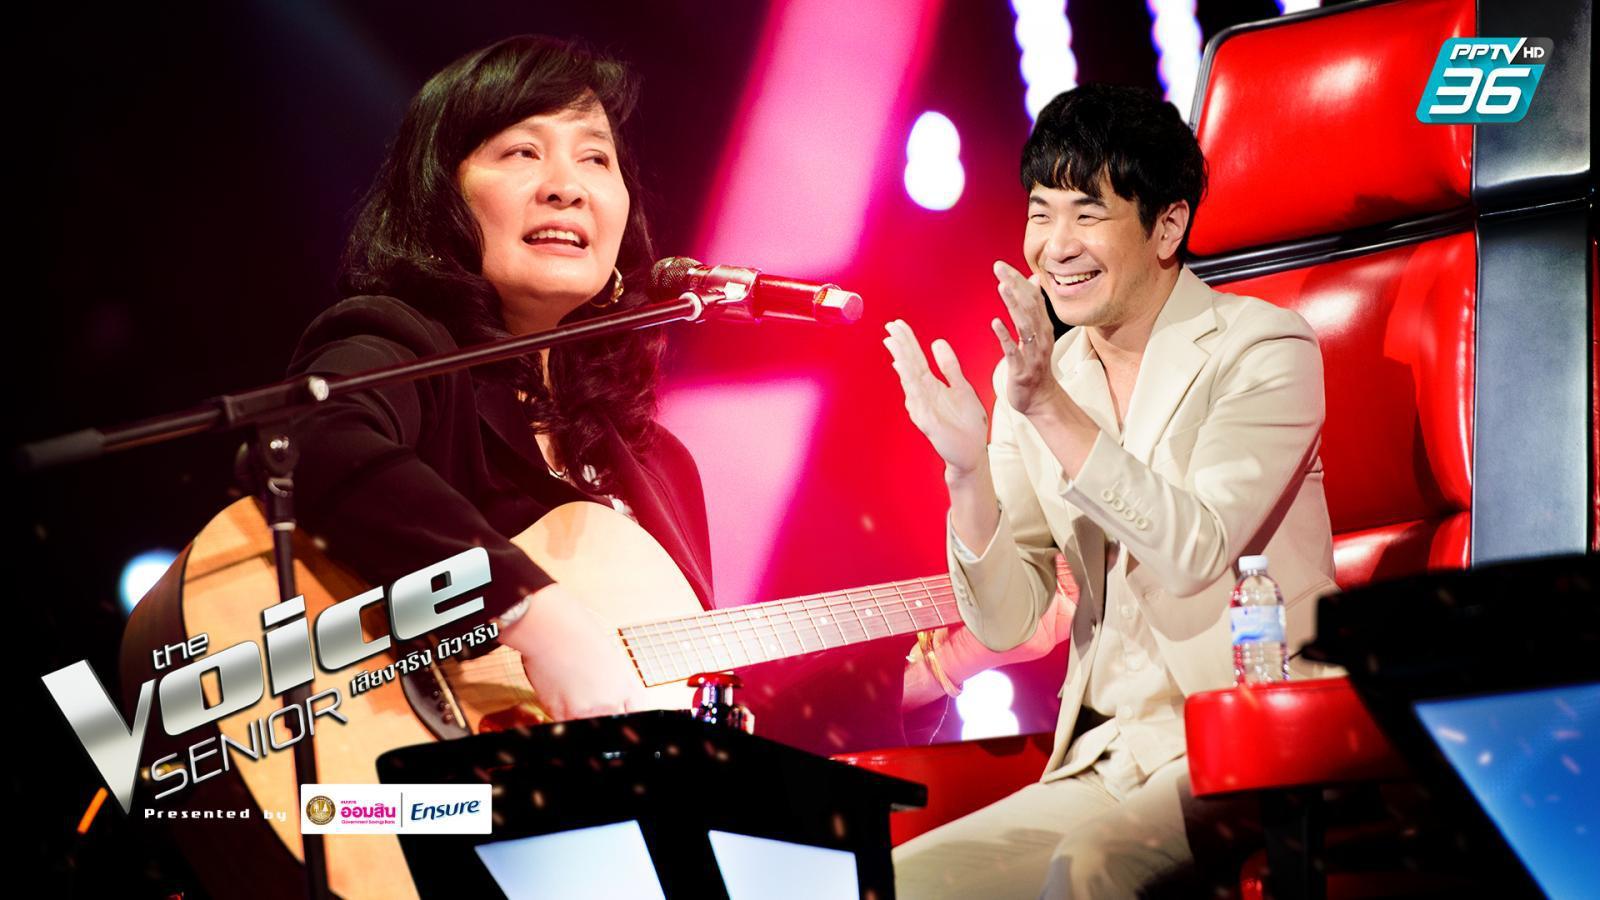 The Voice Senior Thailand 2020 EP.1 |  อายุ 61 ปี แต่เสียงสาวจนนึกว่าอายุ 25